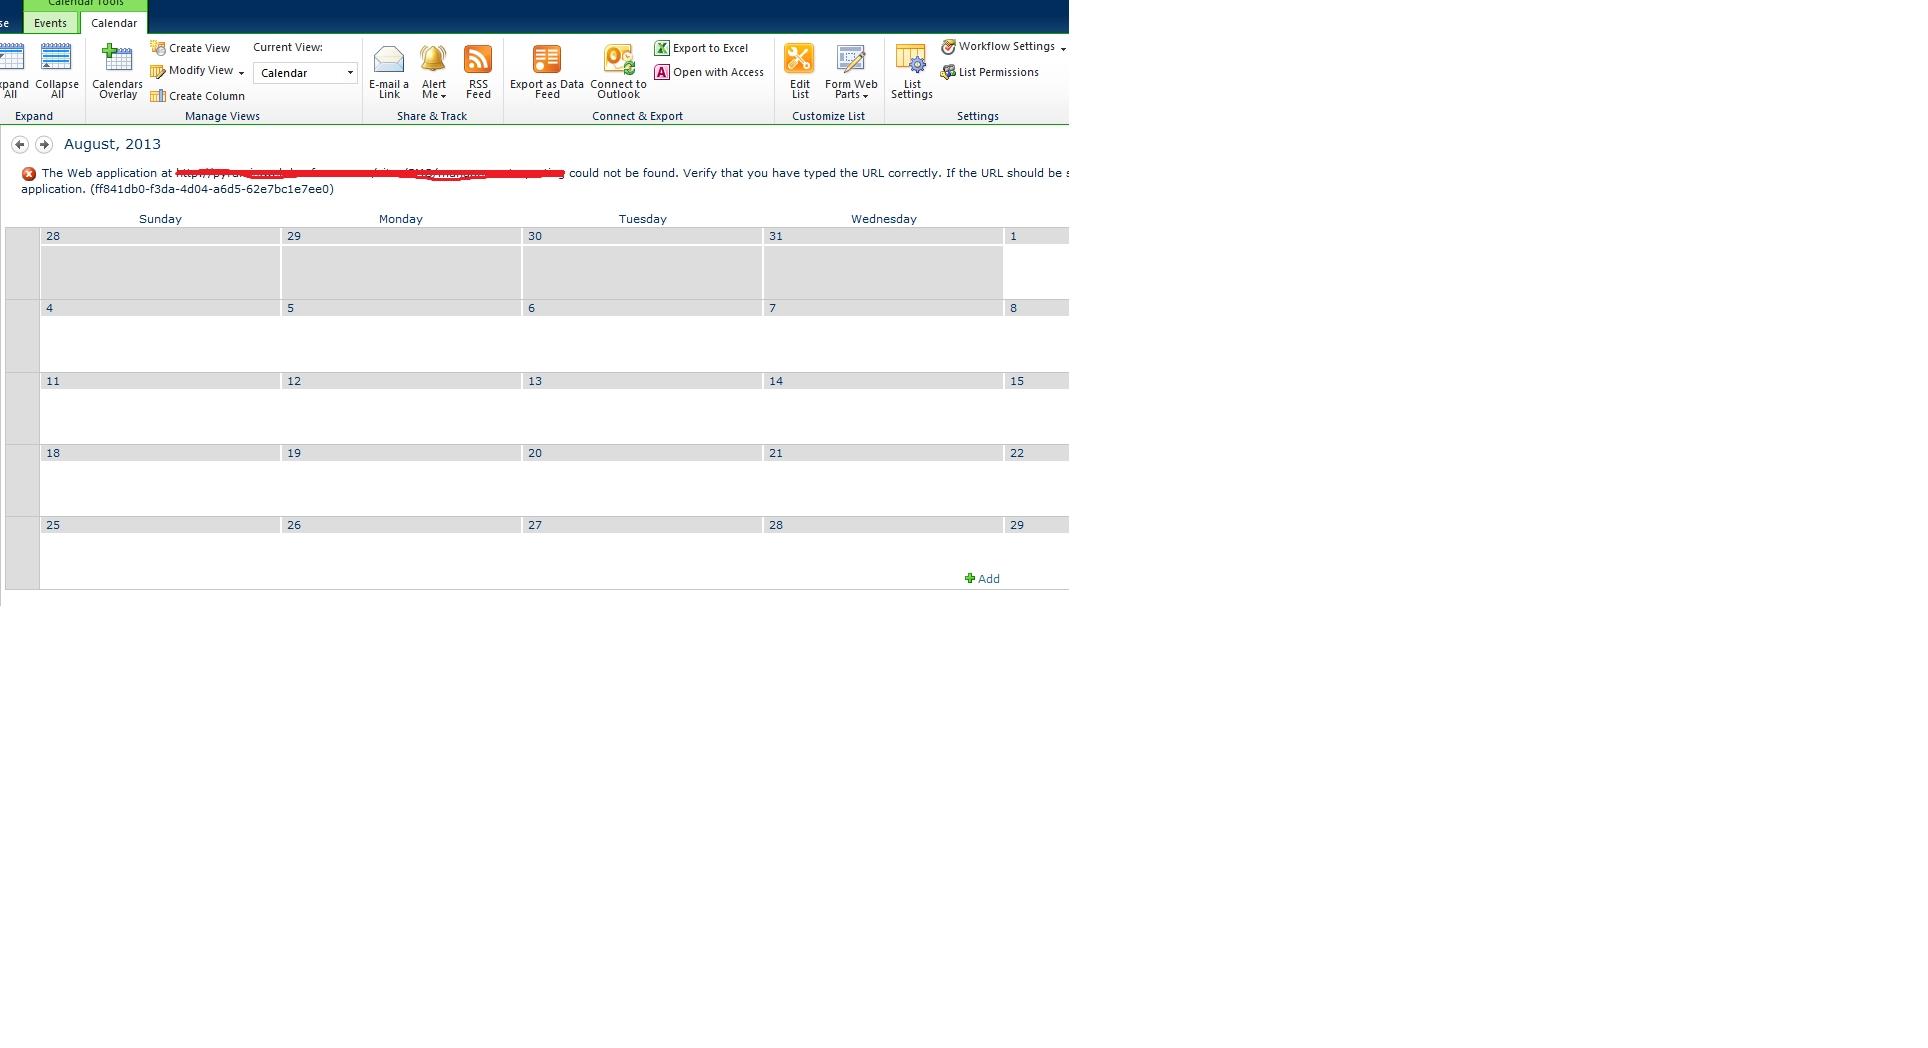 Sharepoint 2010 Calendar Overlay Setting Migration Issues And within Sharepoint 2013 Calendar Overlay Settings